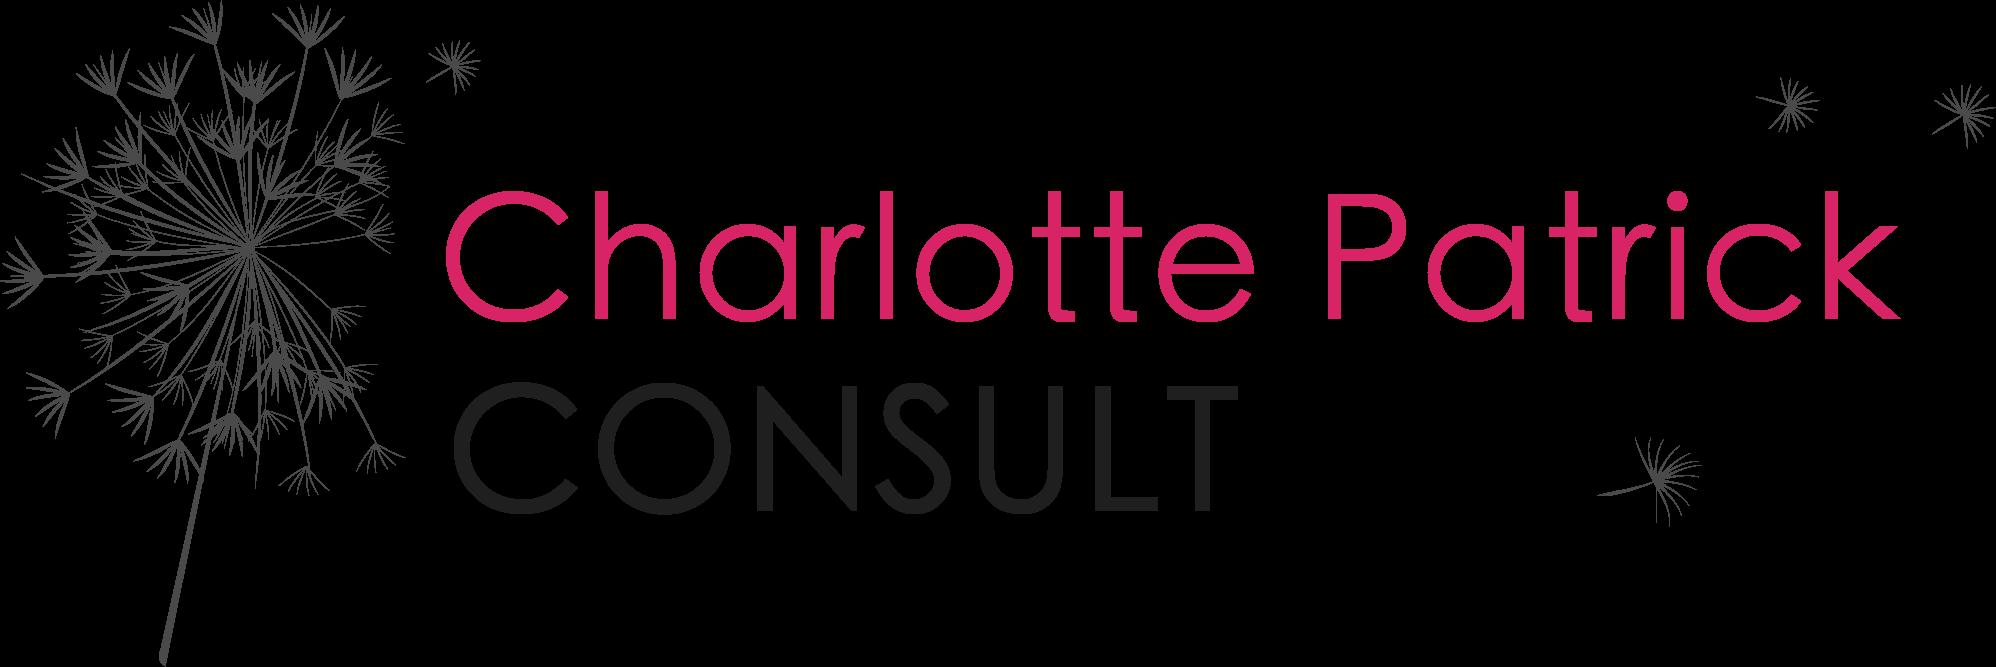 Charlotte Patrick Consult